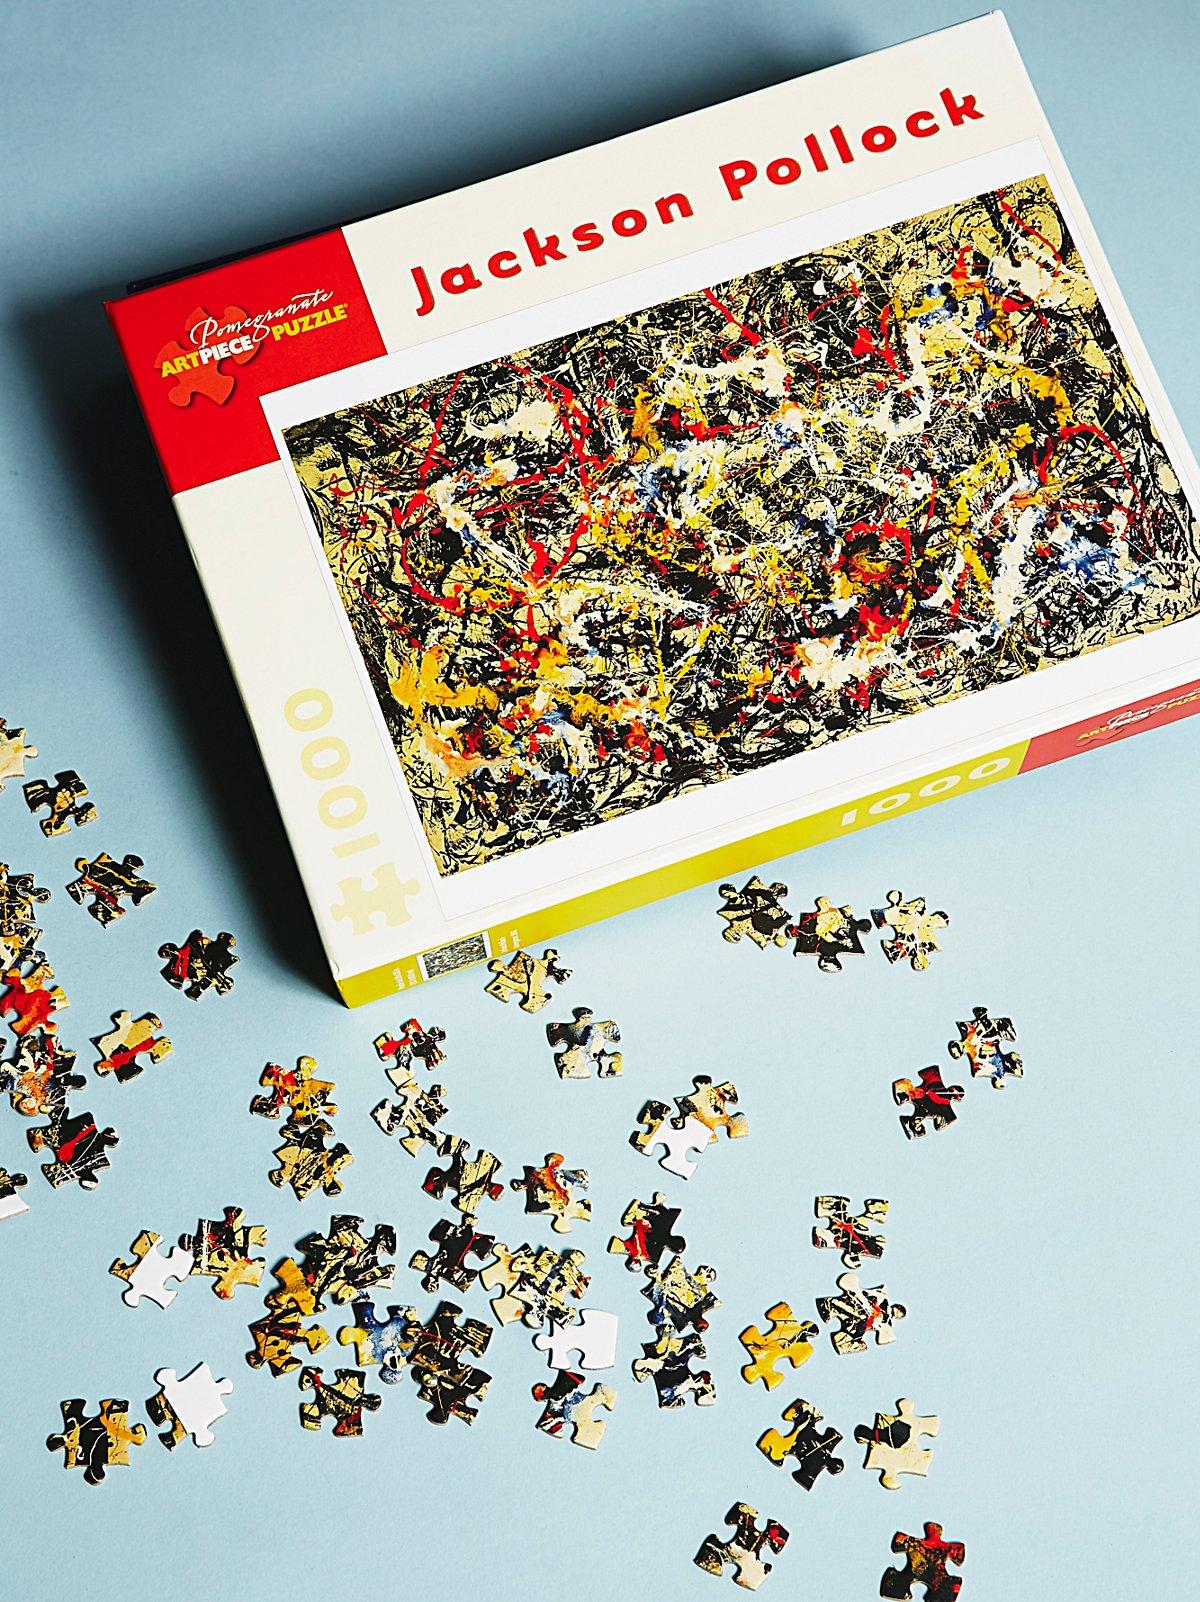 Vintage 1970s Jackson Pollock Jigsaw Puzzle